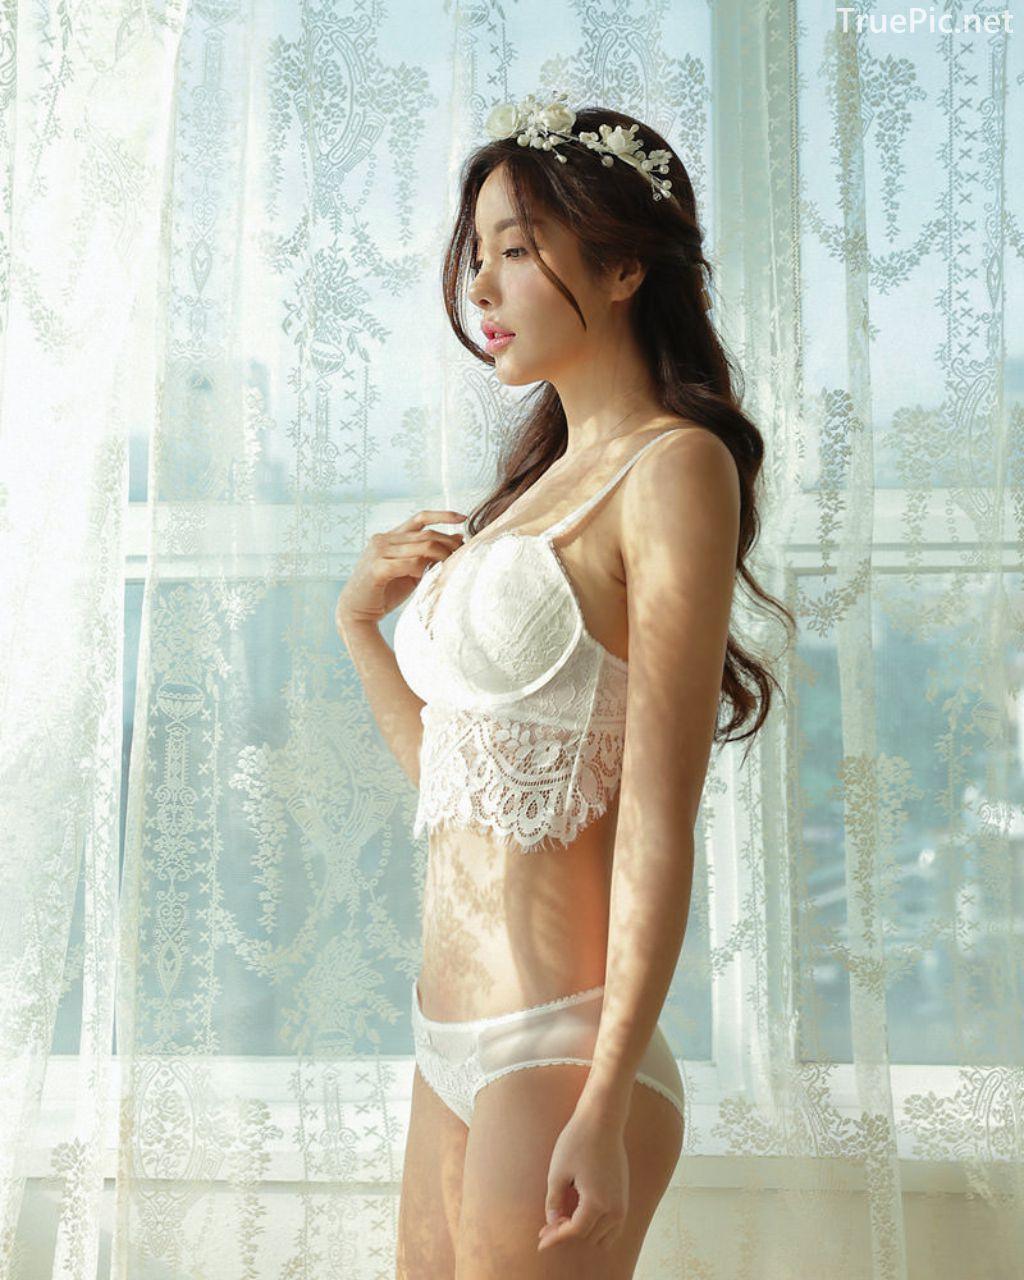 Korean Fashion Model - Jin Hee - Lovely Soft Lace Lingerie - TruePic.net - Picture 5